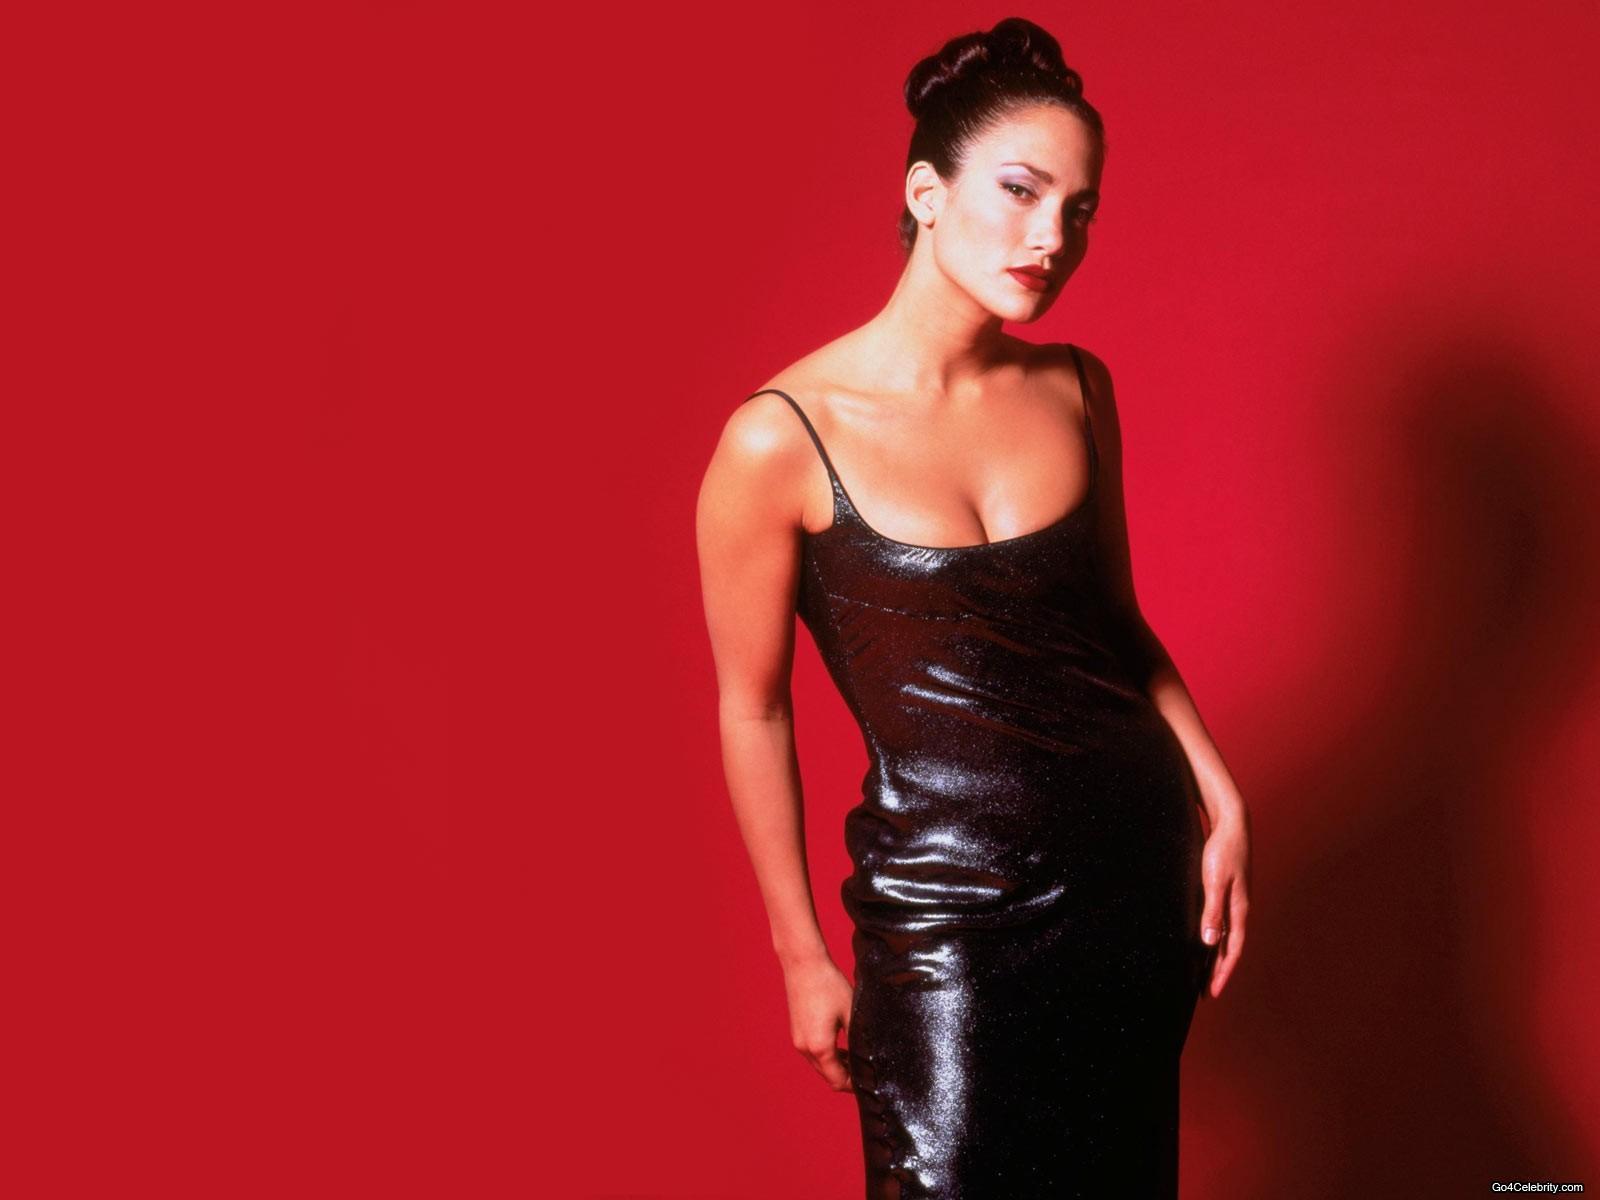 Jennifer Lopez as Selena - Selena (the movie) Wallpaper ...